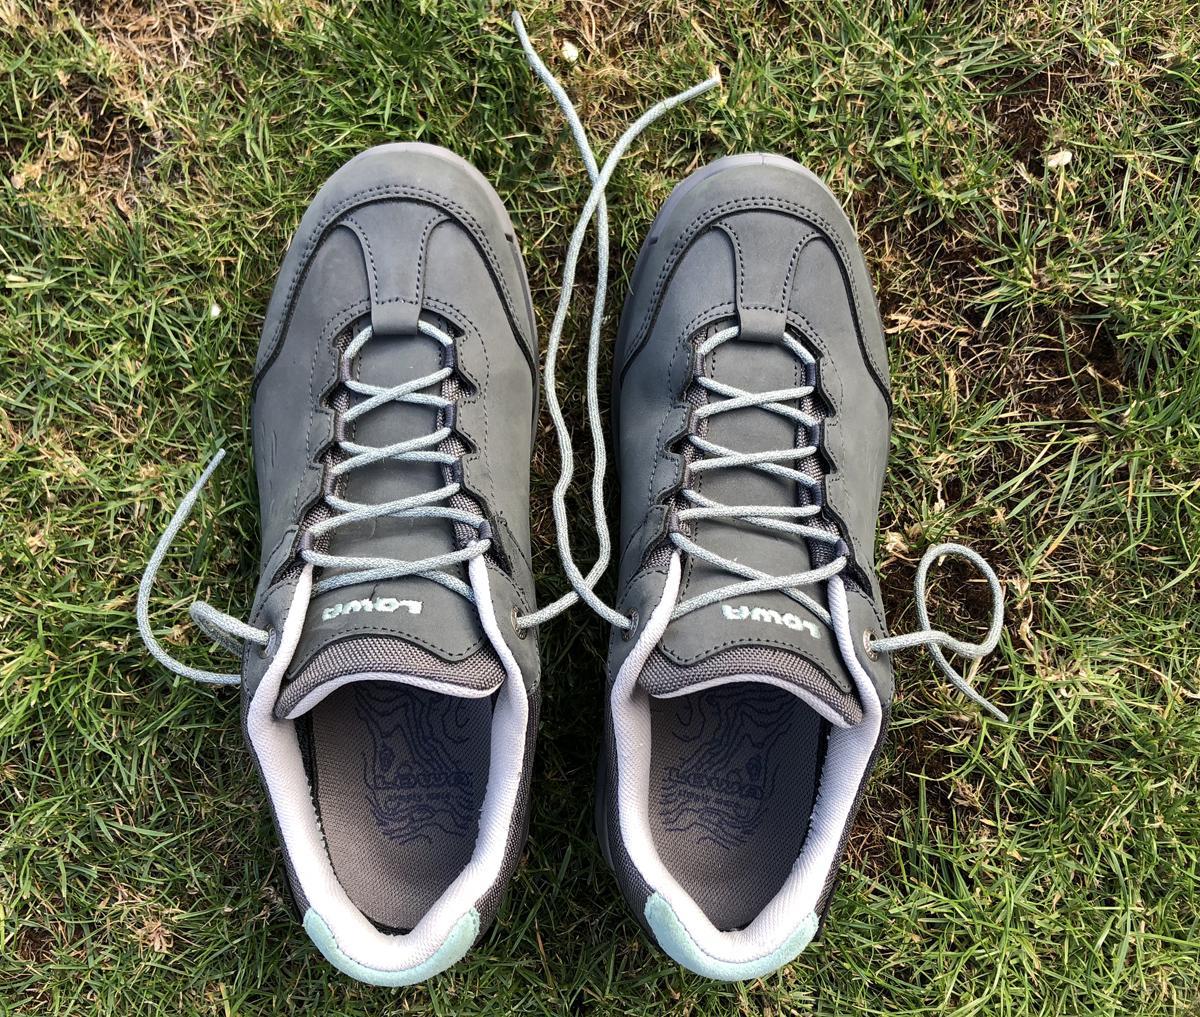 REVIEW | LOWA LOCARNO GTX LO WALKING SHOES